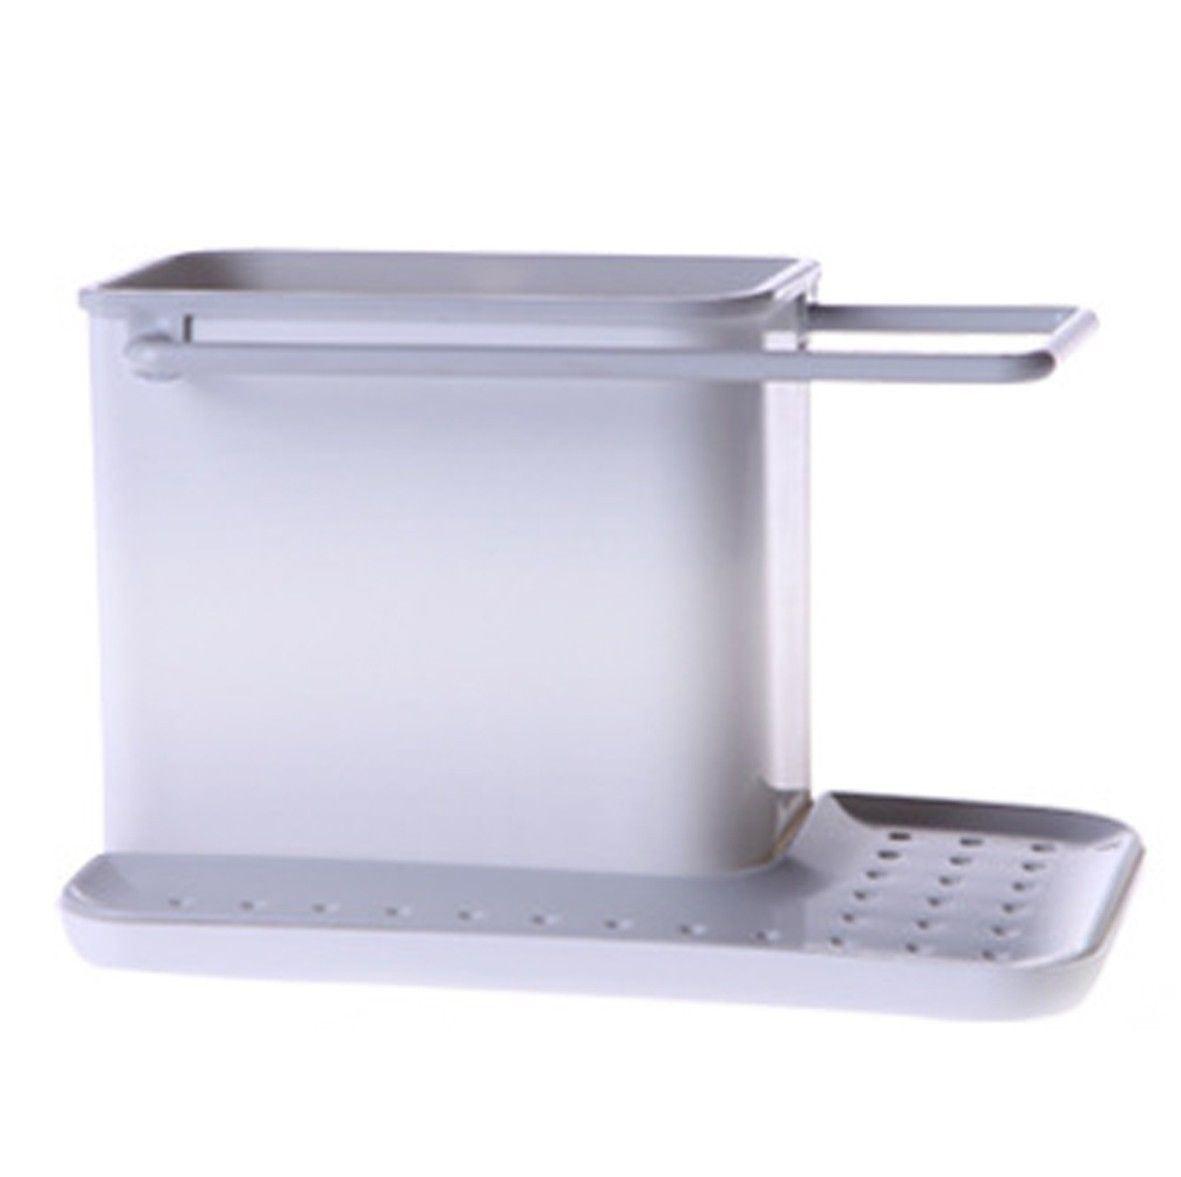 Plastic Sink Caddy Organizer Space Storage Racks Cabinet